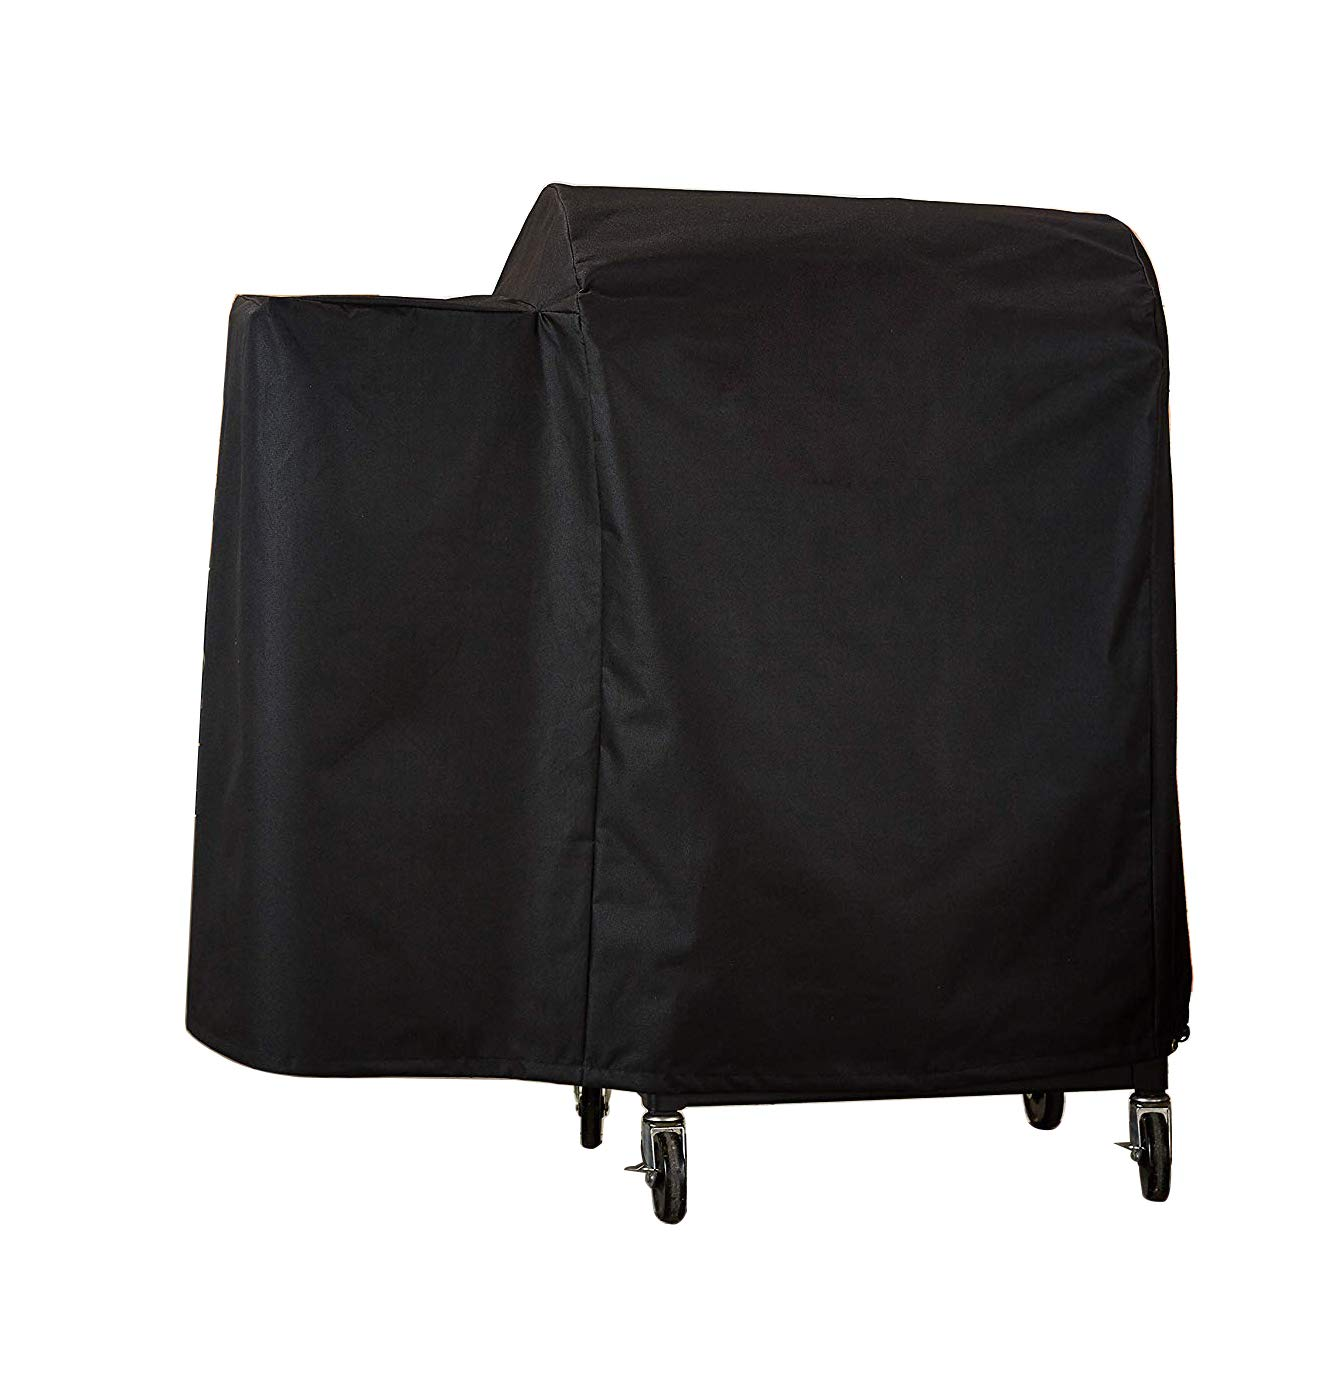 Cookingstar Heavy Duty Waterproof Cover Fit Pit Boss 700FB Wood Pellet Grills by Cookingstar